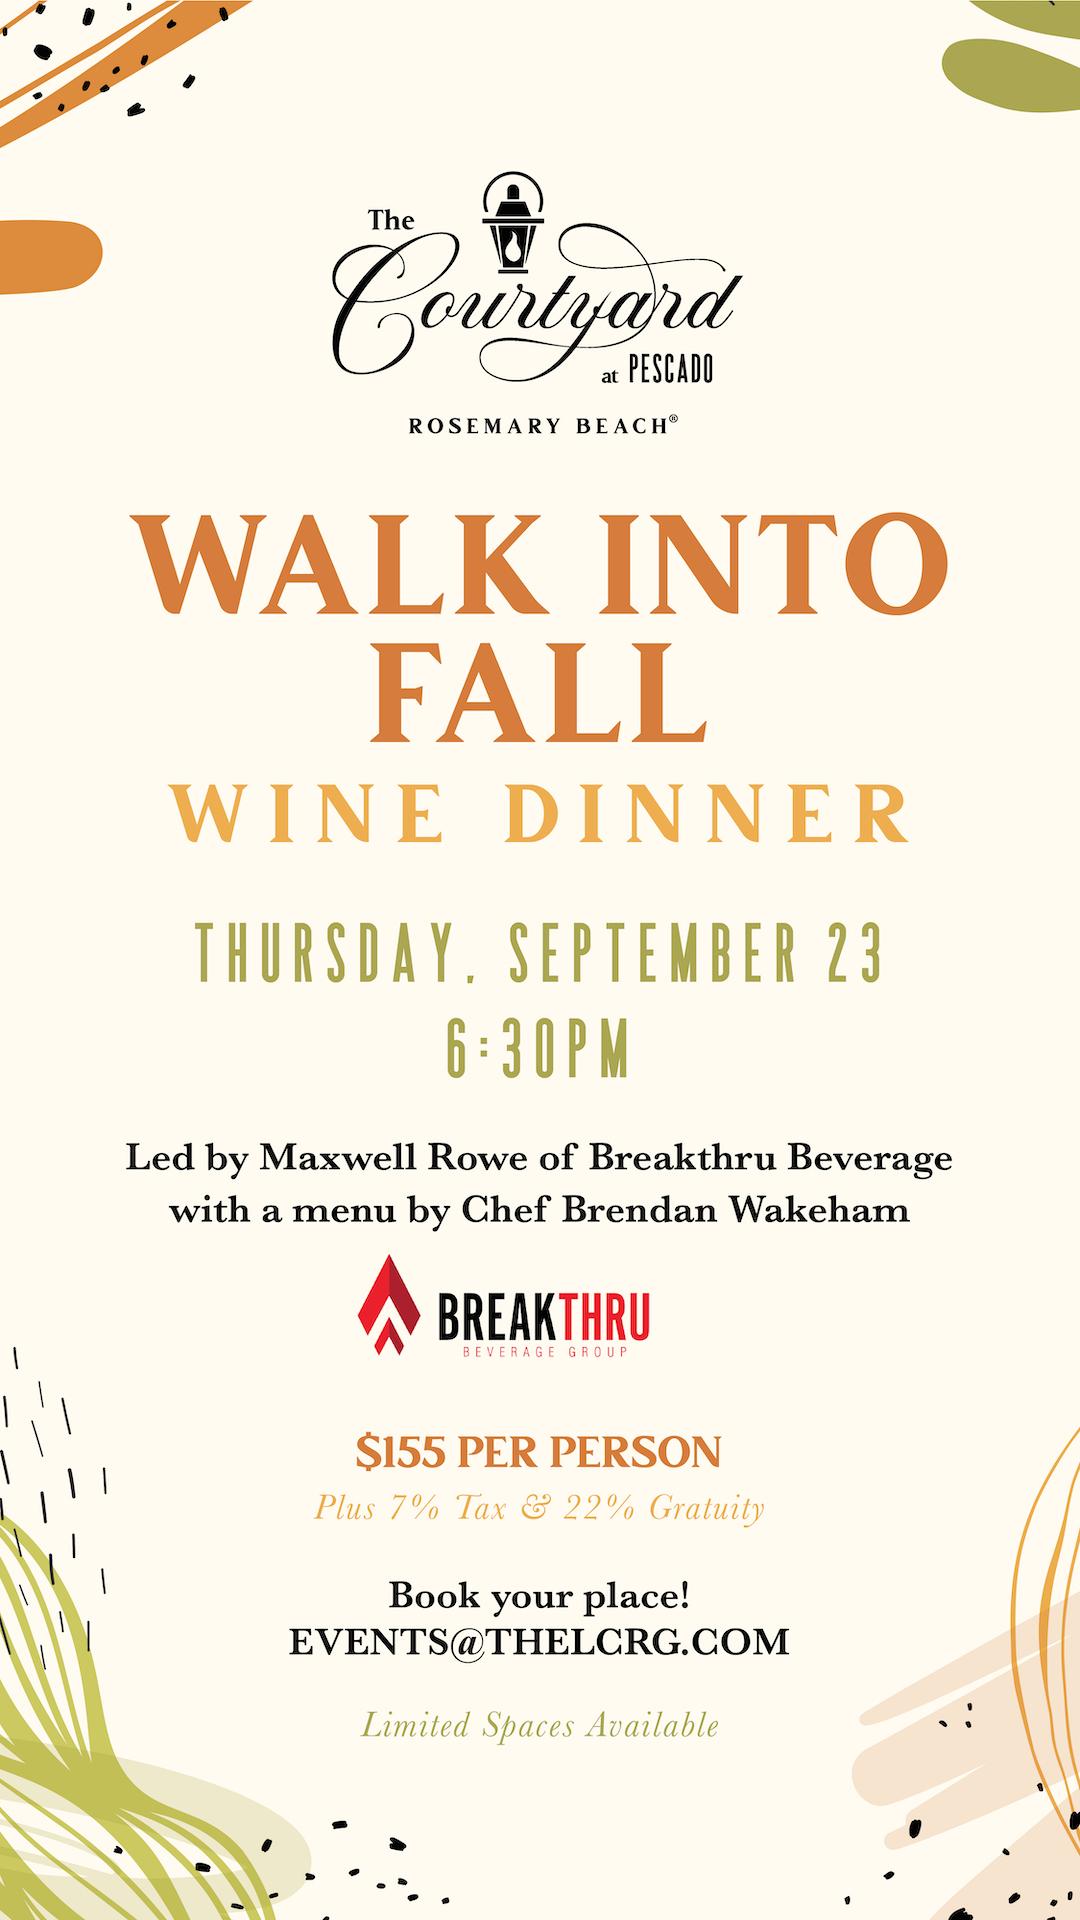 Walk into Fall Wine Dinner Led by Maxwell Rowe of Breakthru Beverage